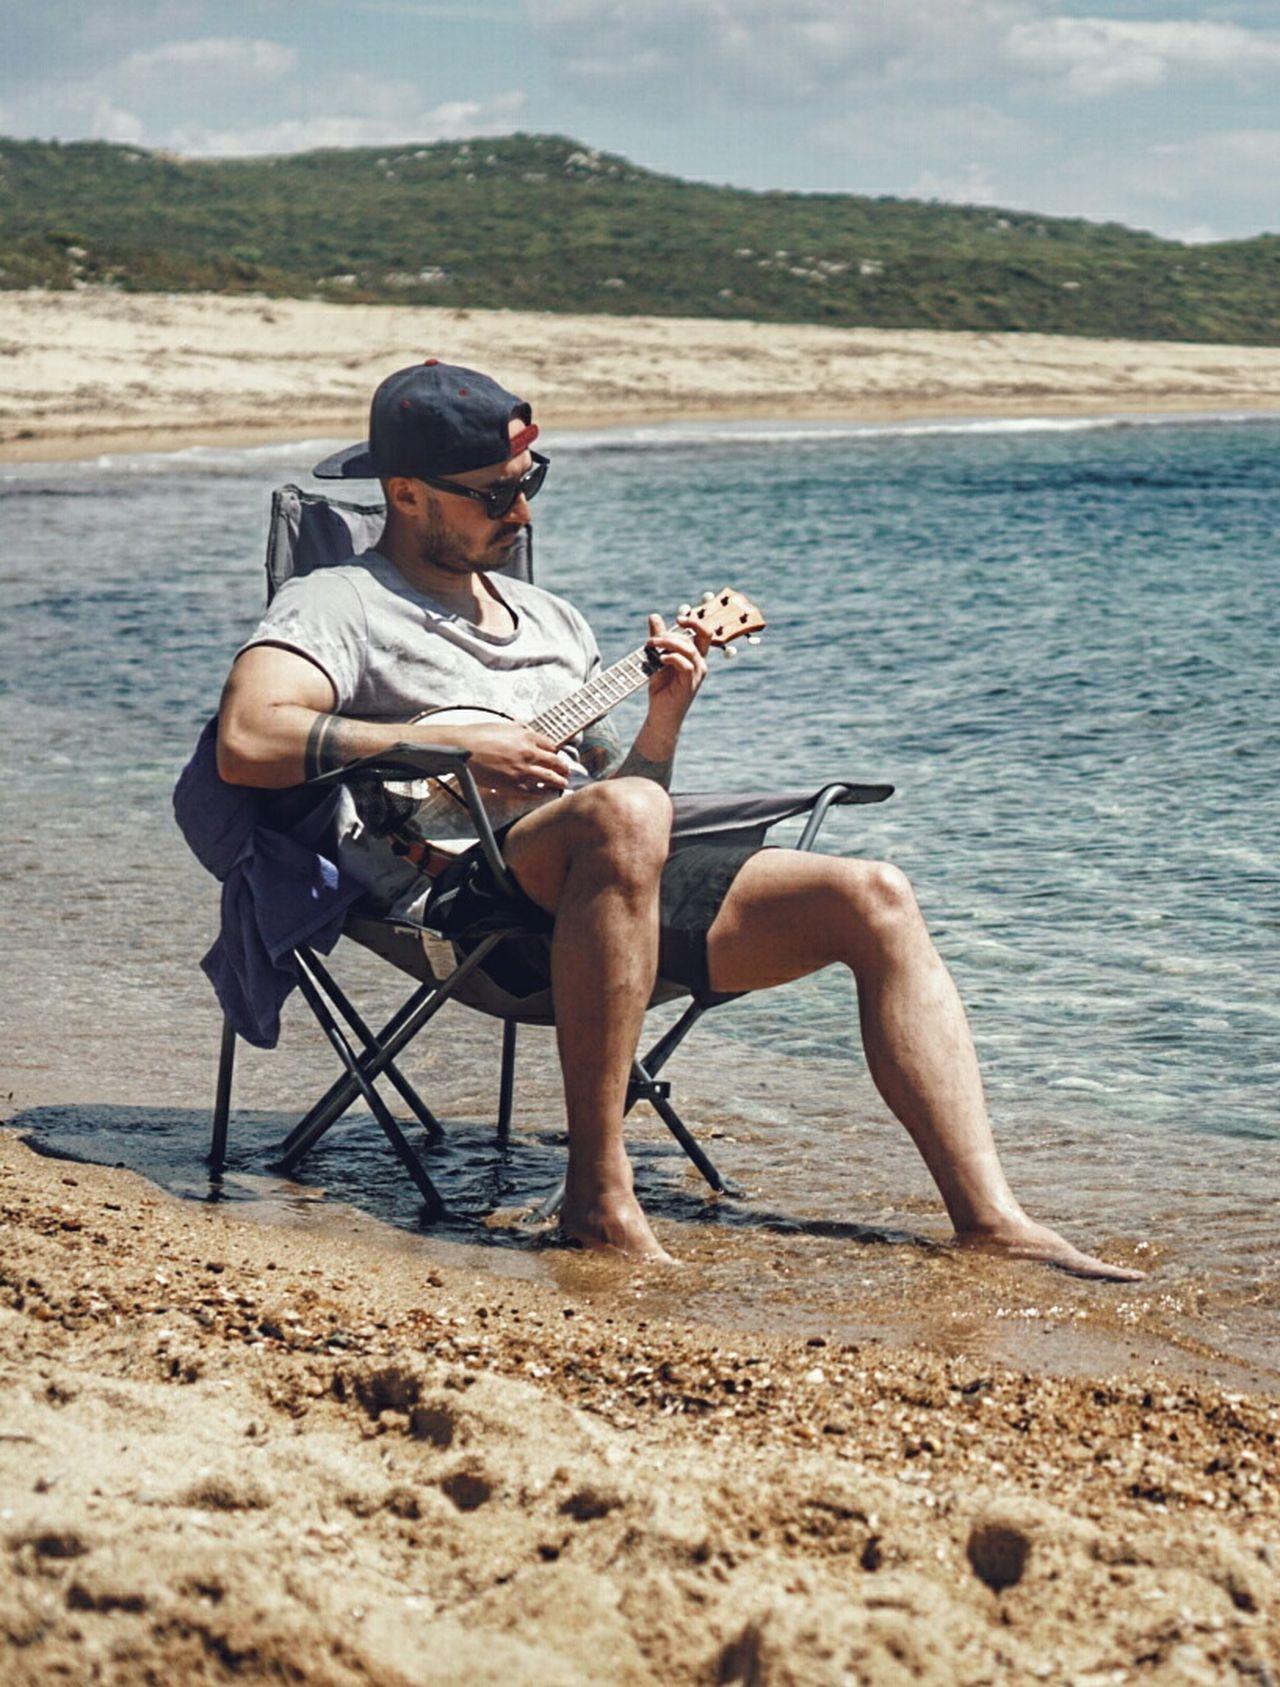 This is the Beach called Uzunkum in Saroz Turkey . This Cool Guy with Banjo is one of my best friends @cem_celik He is also a great photographer. Check his portfolio. Eye4photography  EyeEm Best Shots EyeEmBestPics EyeEmbestshots